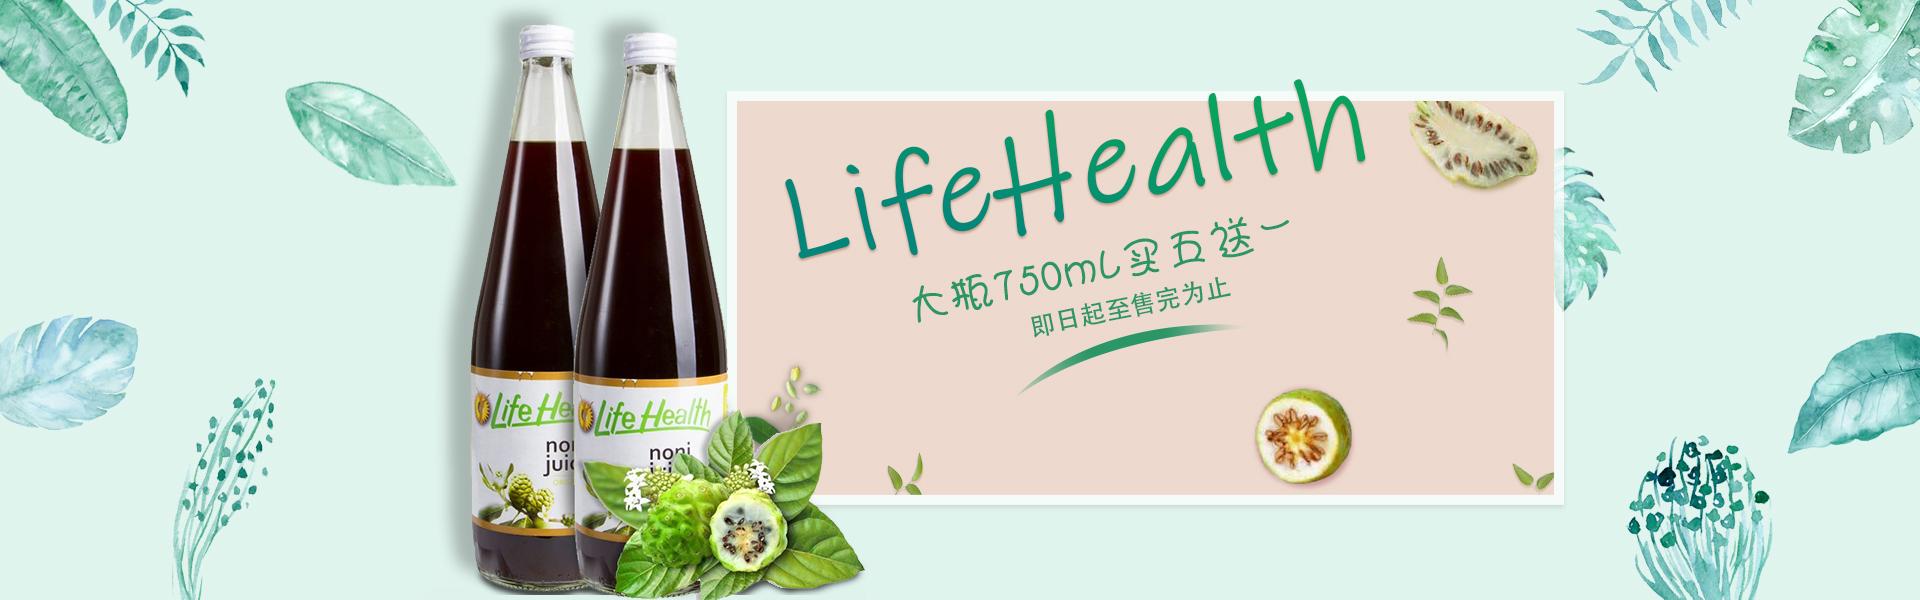 Life Health 有机诺丽酵素原液 750ml 买五赠一